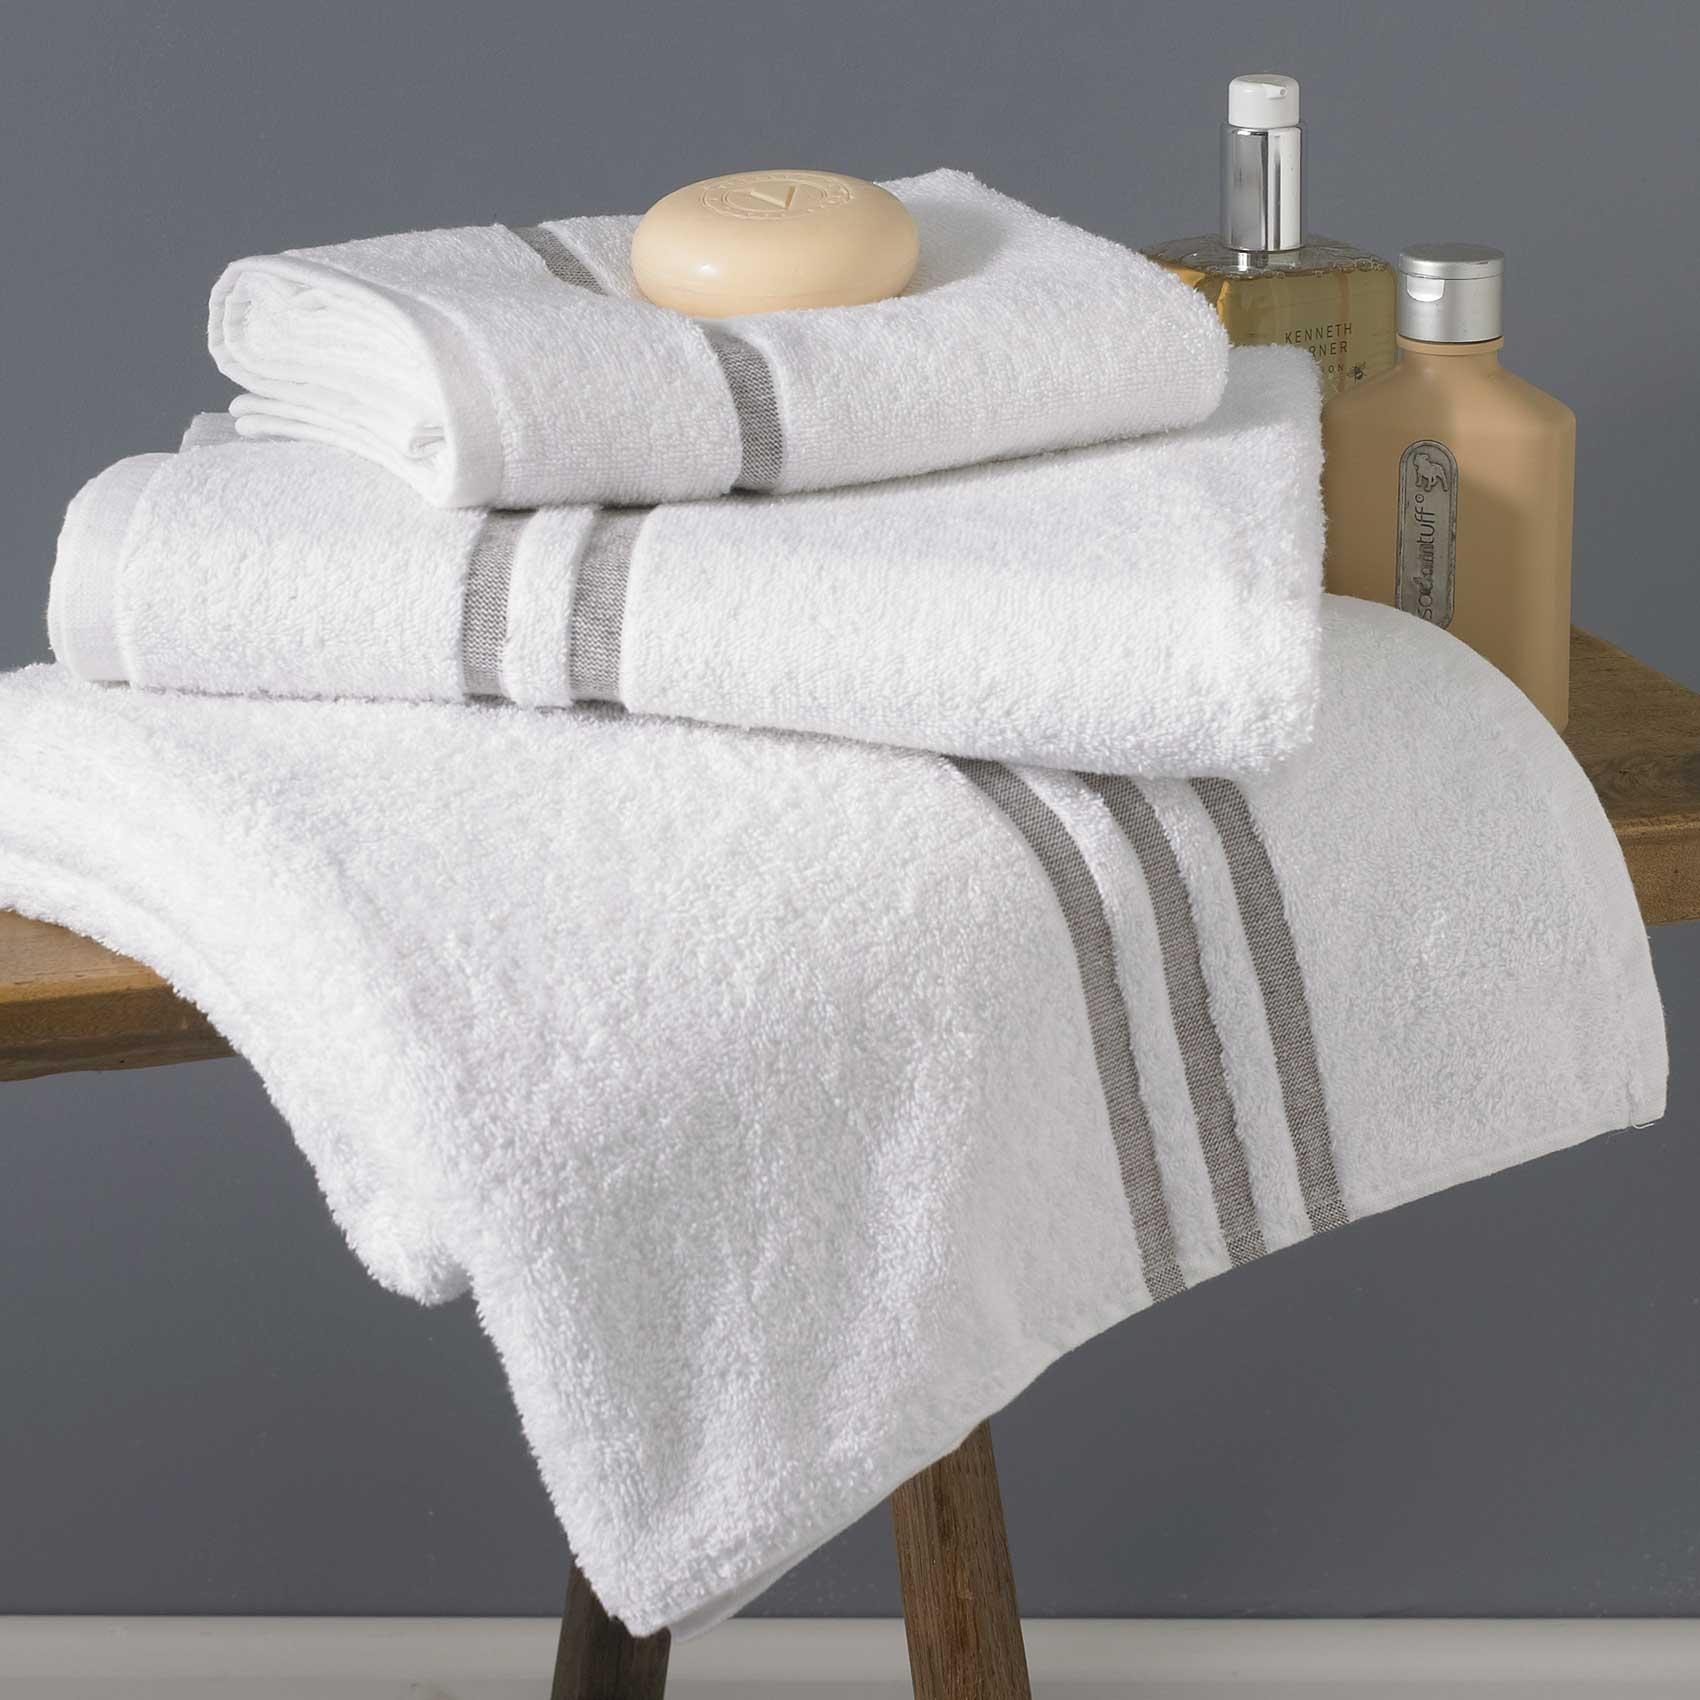 Brown land 450 Gsm Towels